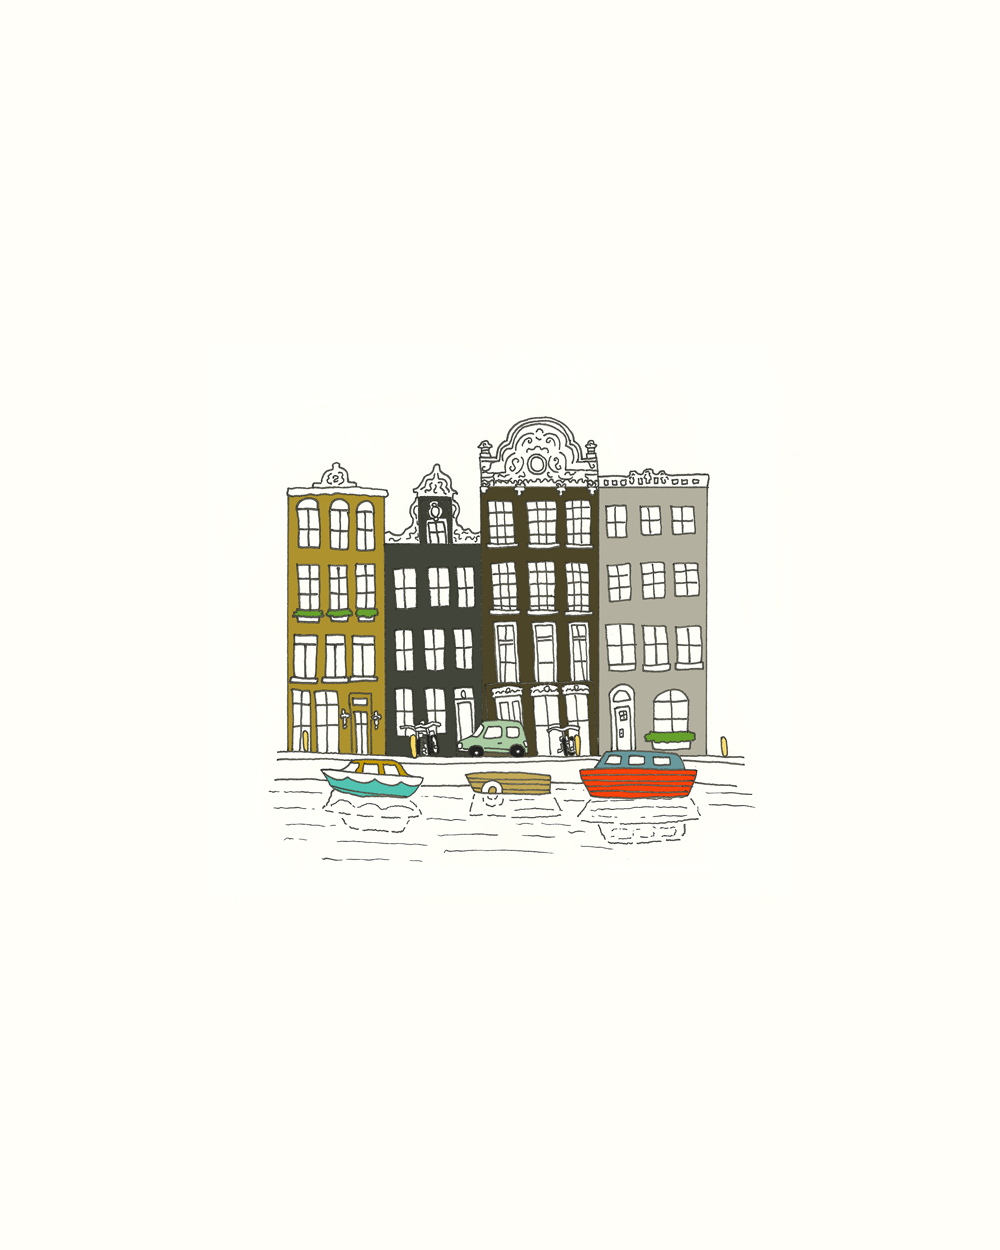 Amsterdam Canal. Kathryn Zaremba 2014